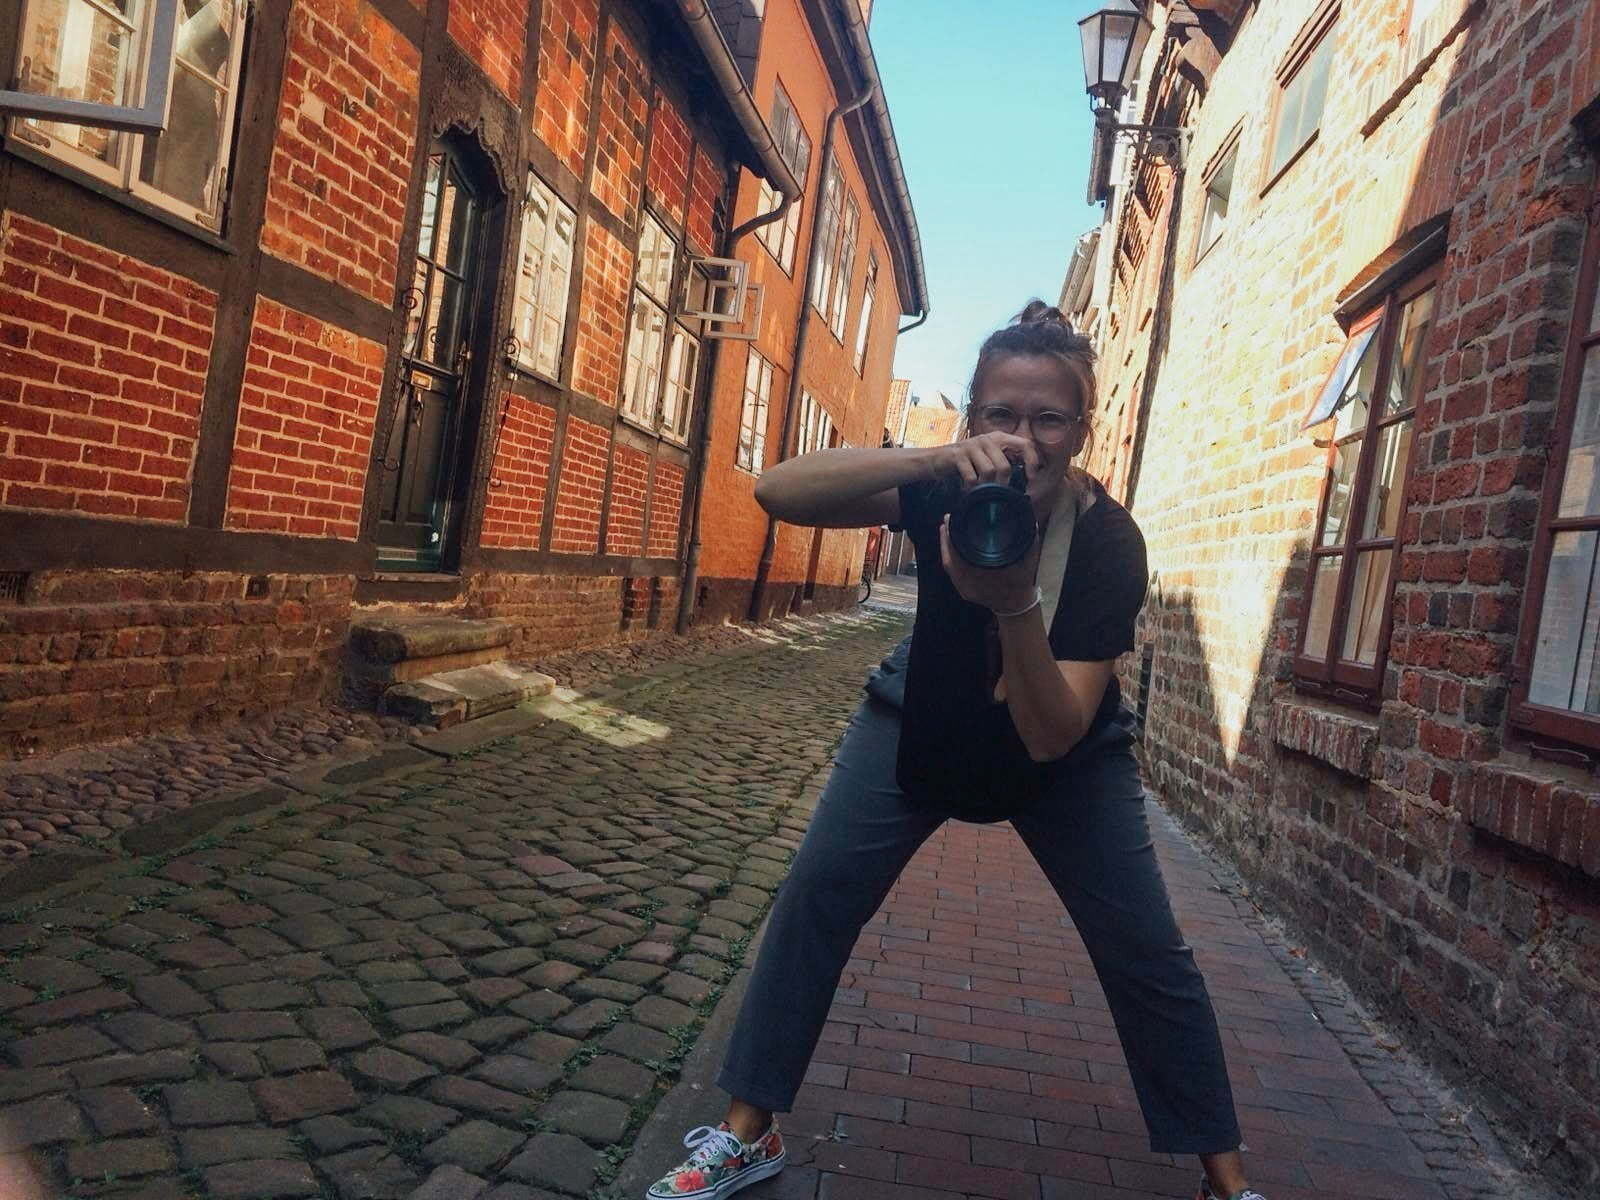 Fotografin Mirjam Kilter mit Kamera in der Hand in Lüneburg